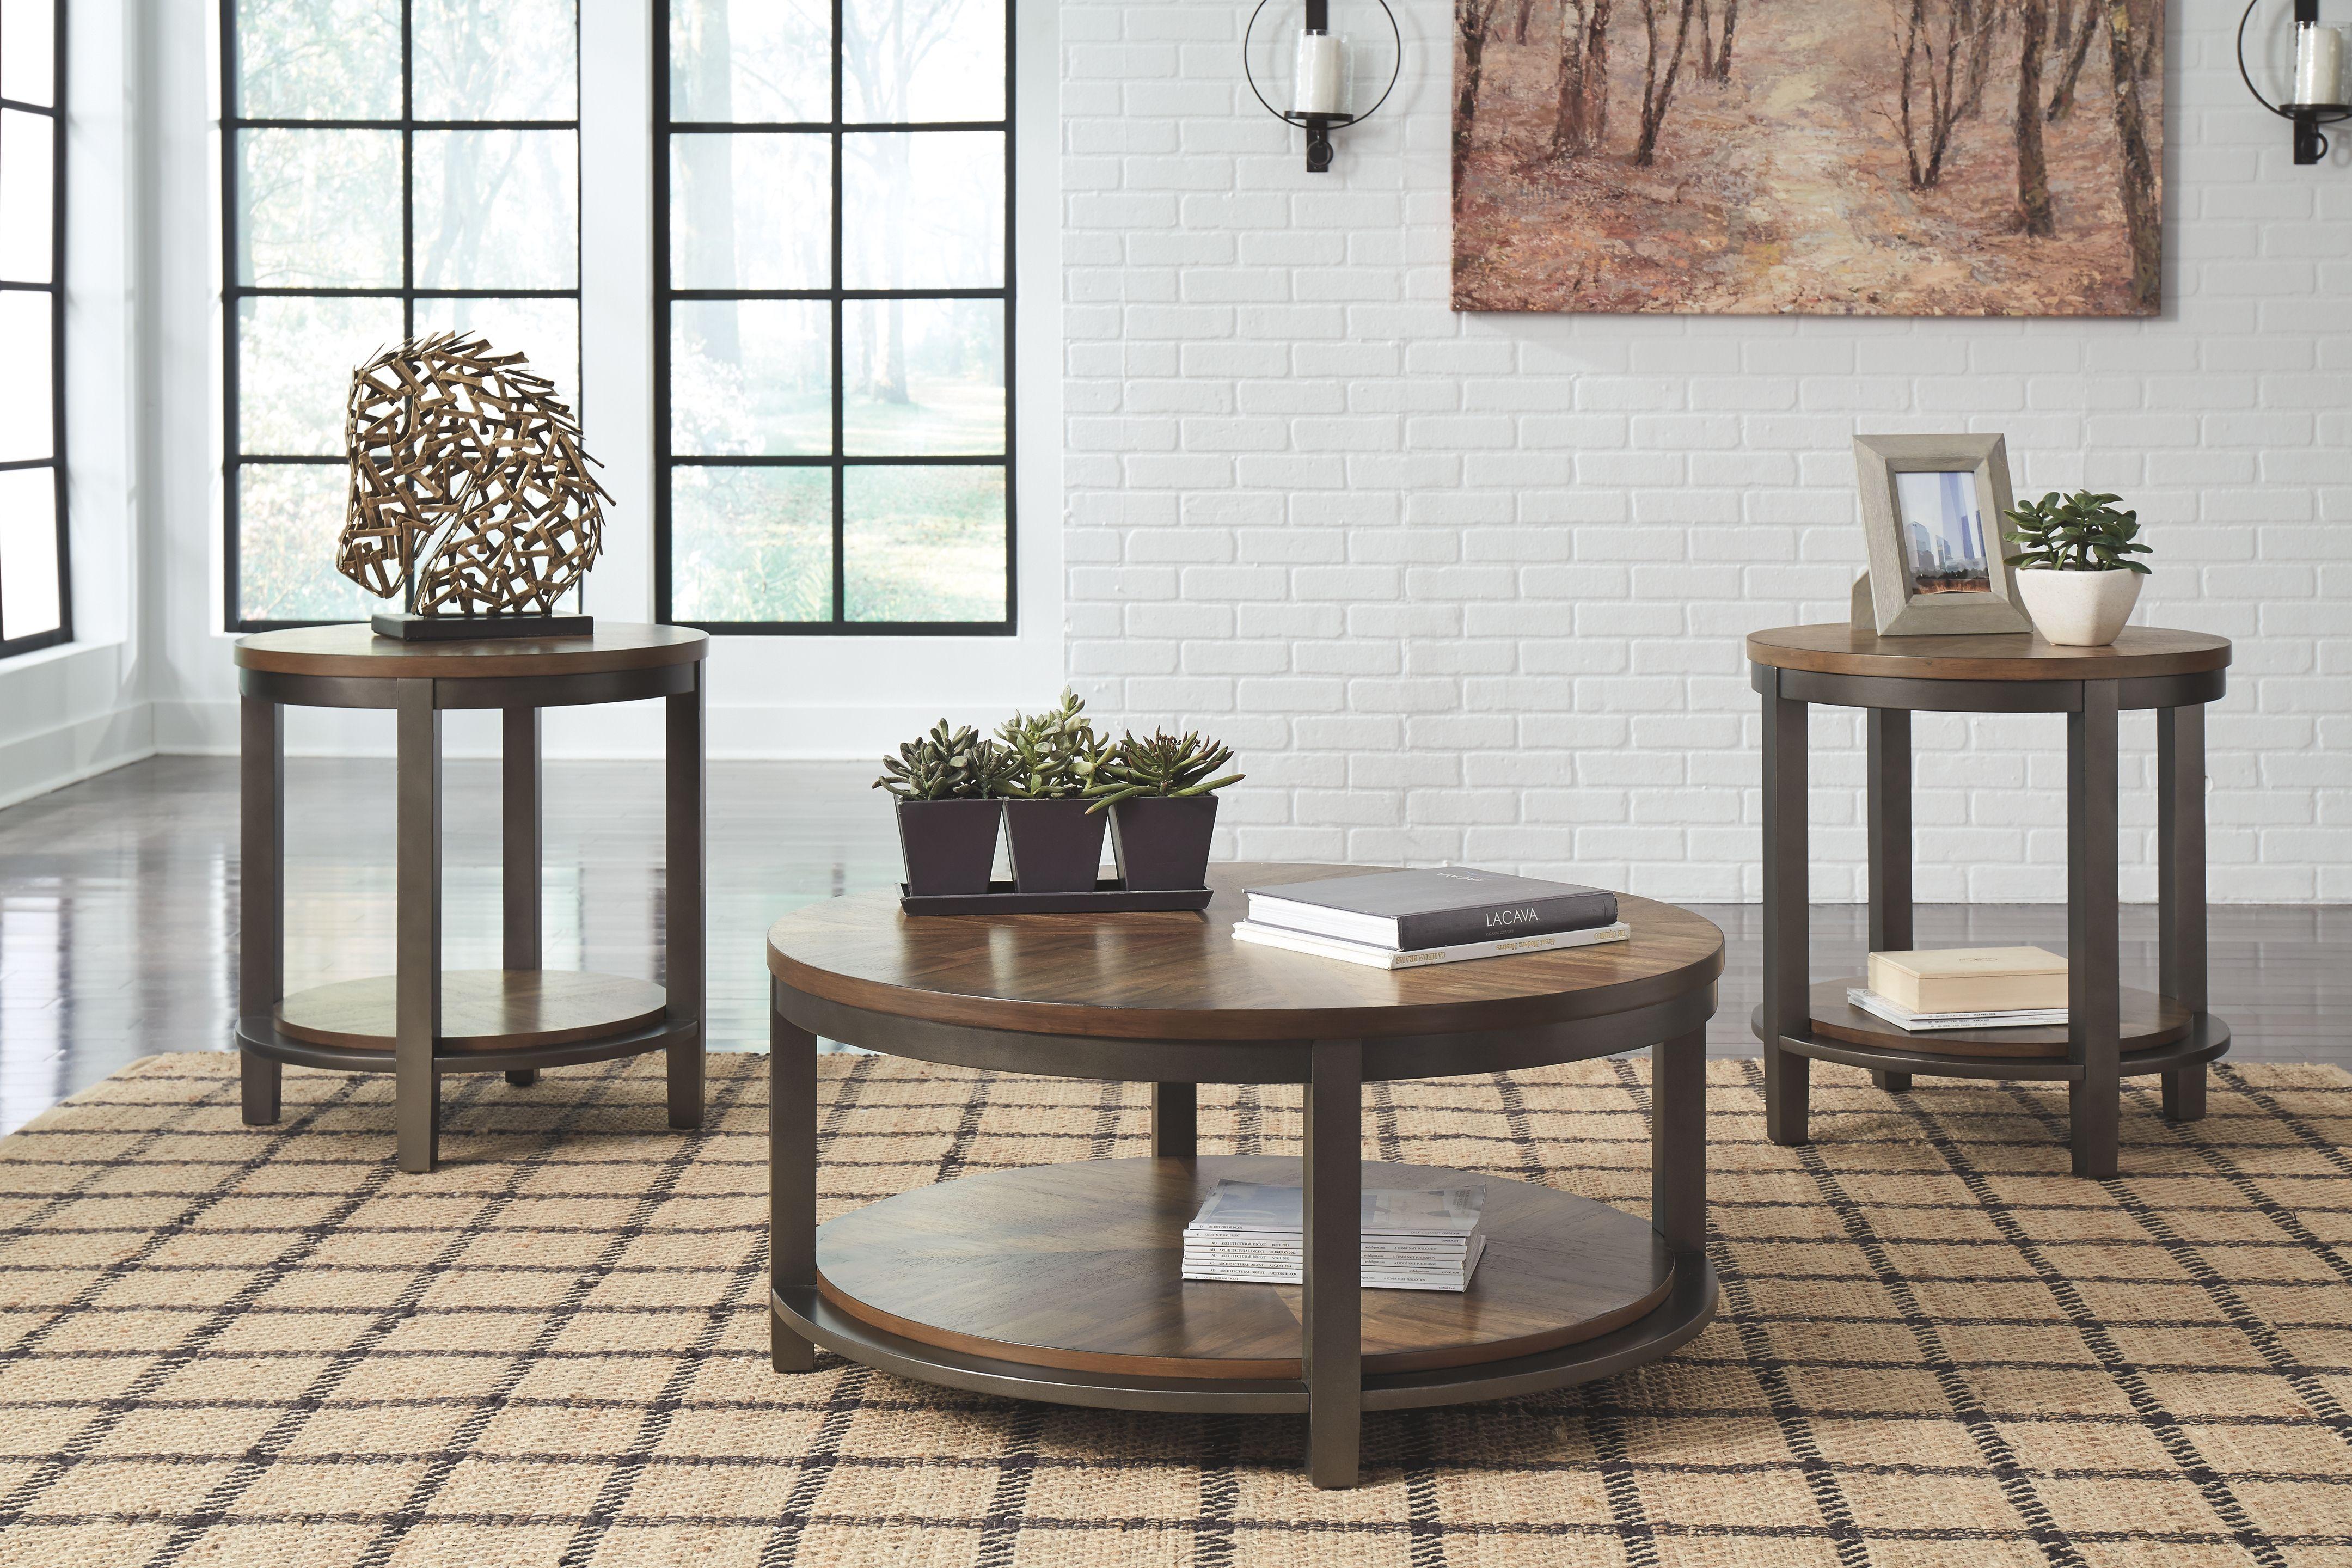 Roybeck Table Set Of 3 Light Brown Bronze In 2020 3 Piece Coffee Table Set Table Table Settings